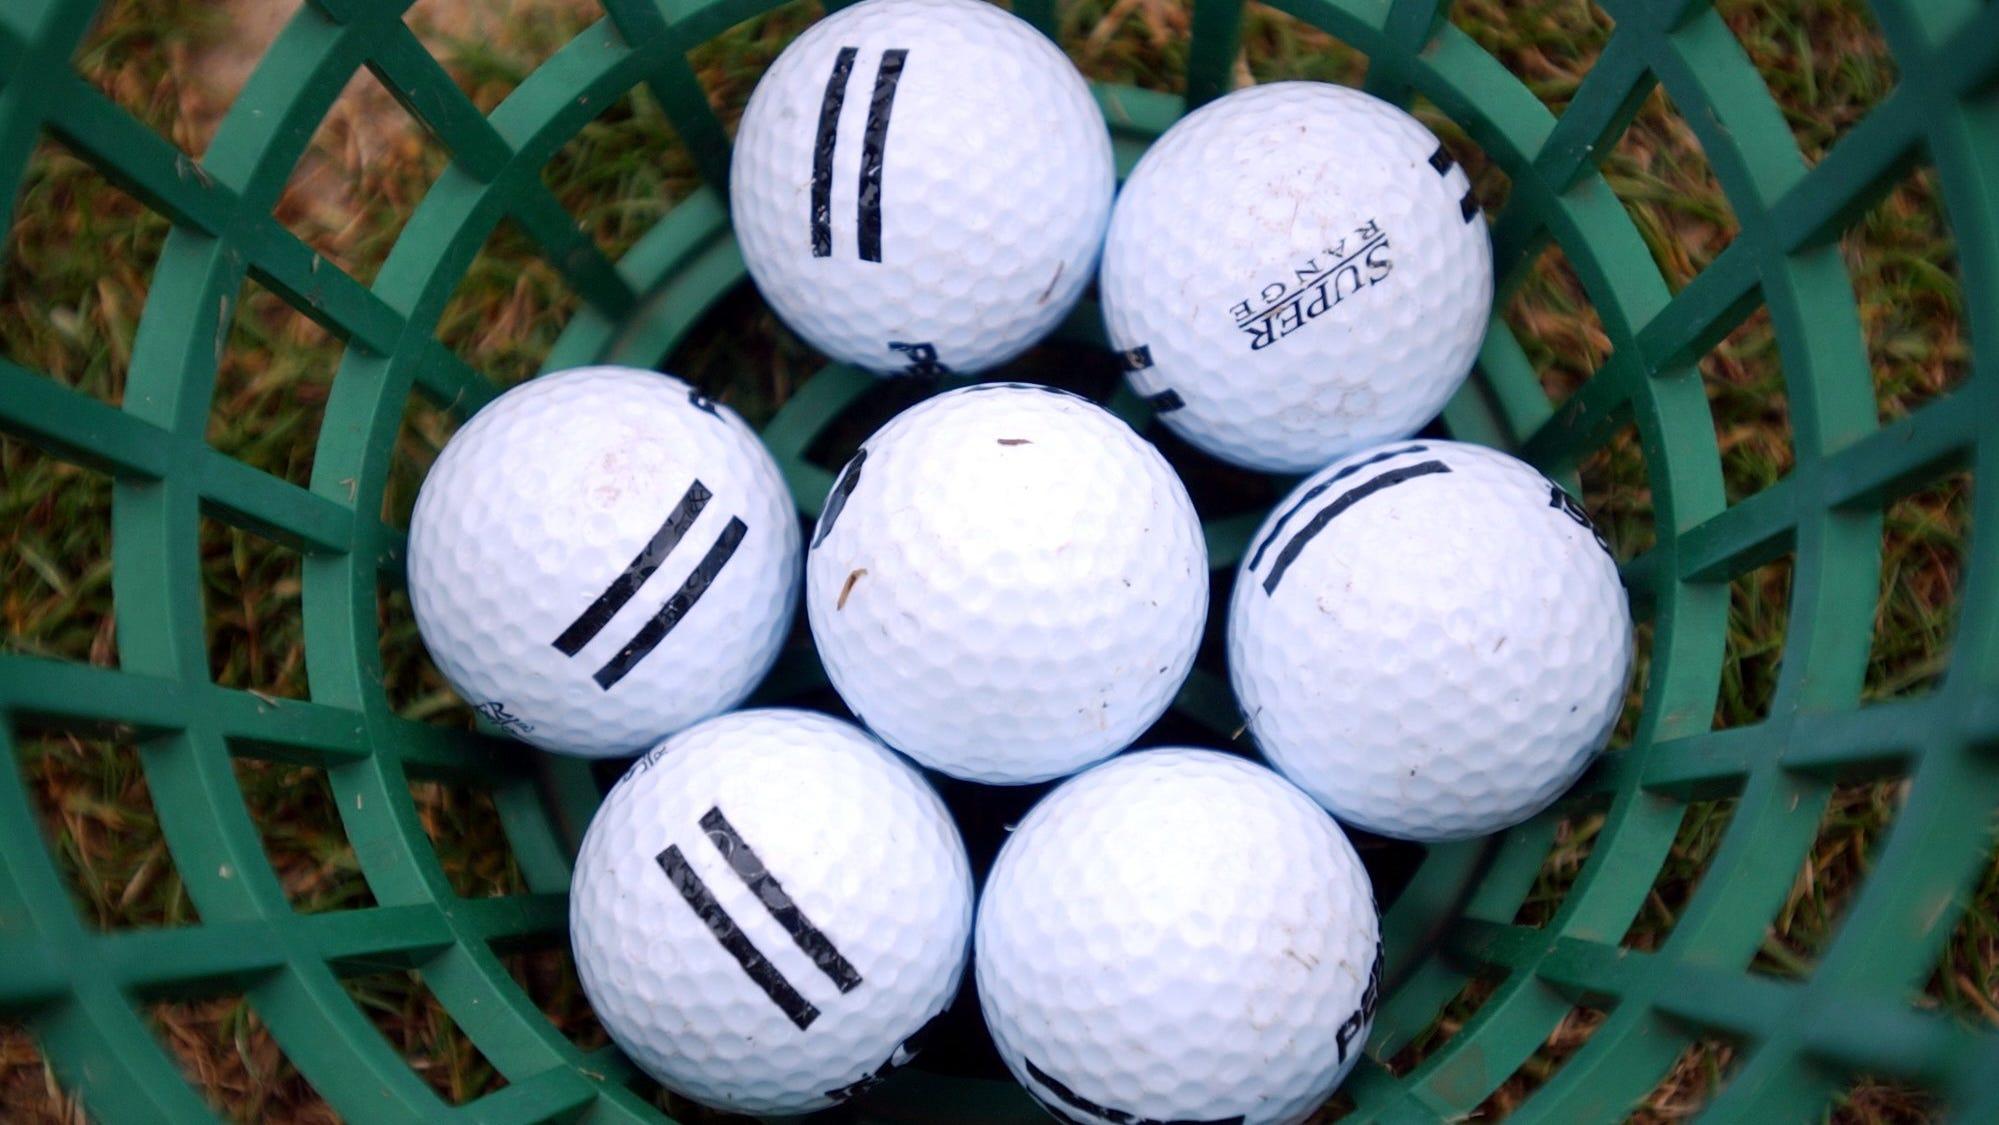 f4cfe026 a035 46c9 a6ad 182344f0593e 1027592445 FL LAK golfball1 JPG?crop=1999,1125,x0,y91&width=1999&height=1125&format=pjpg&auto=webp.